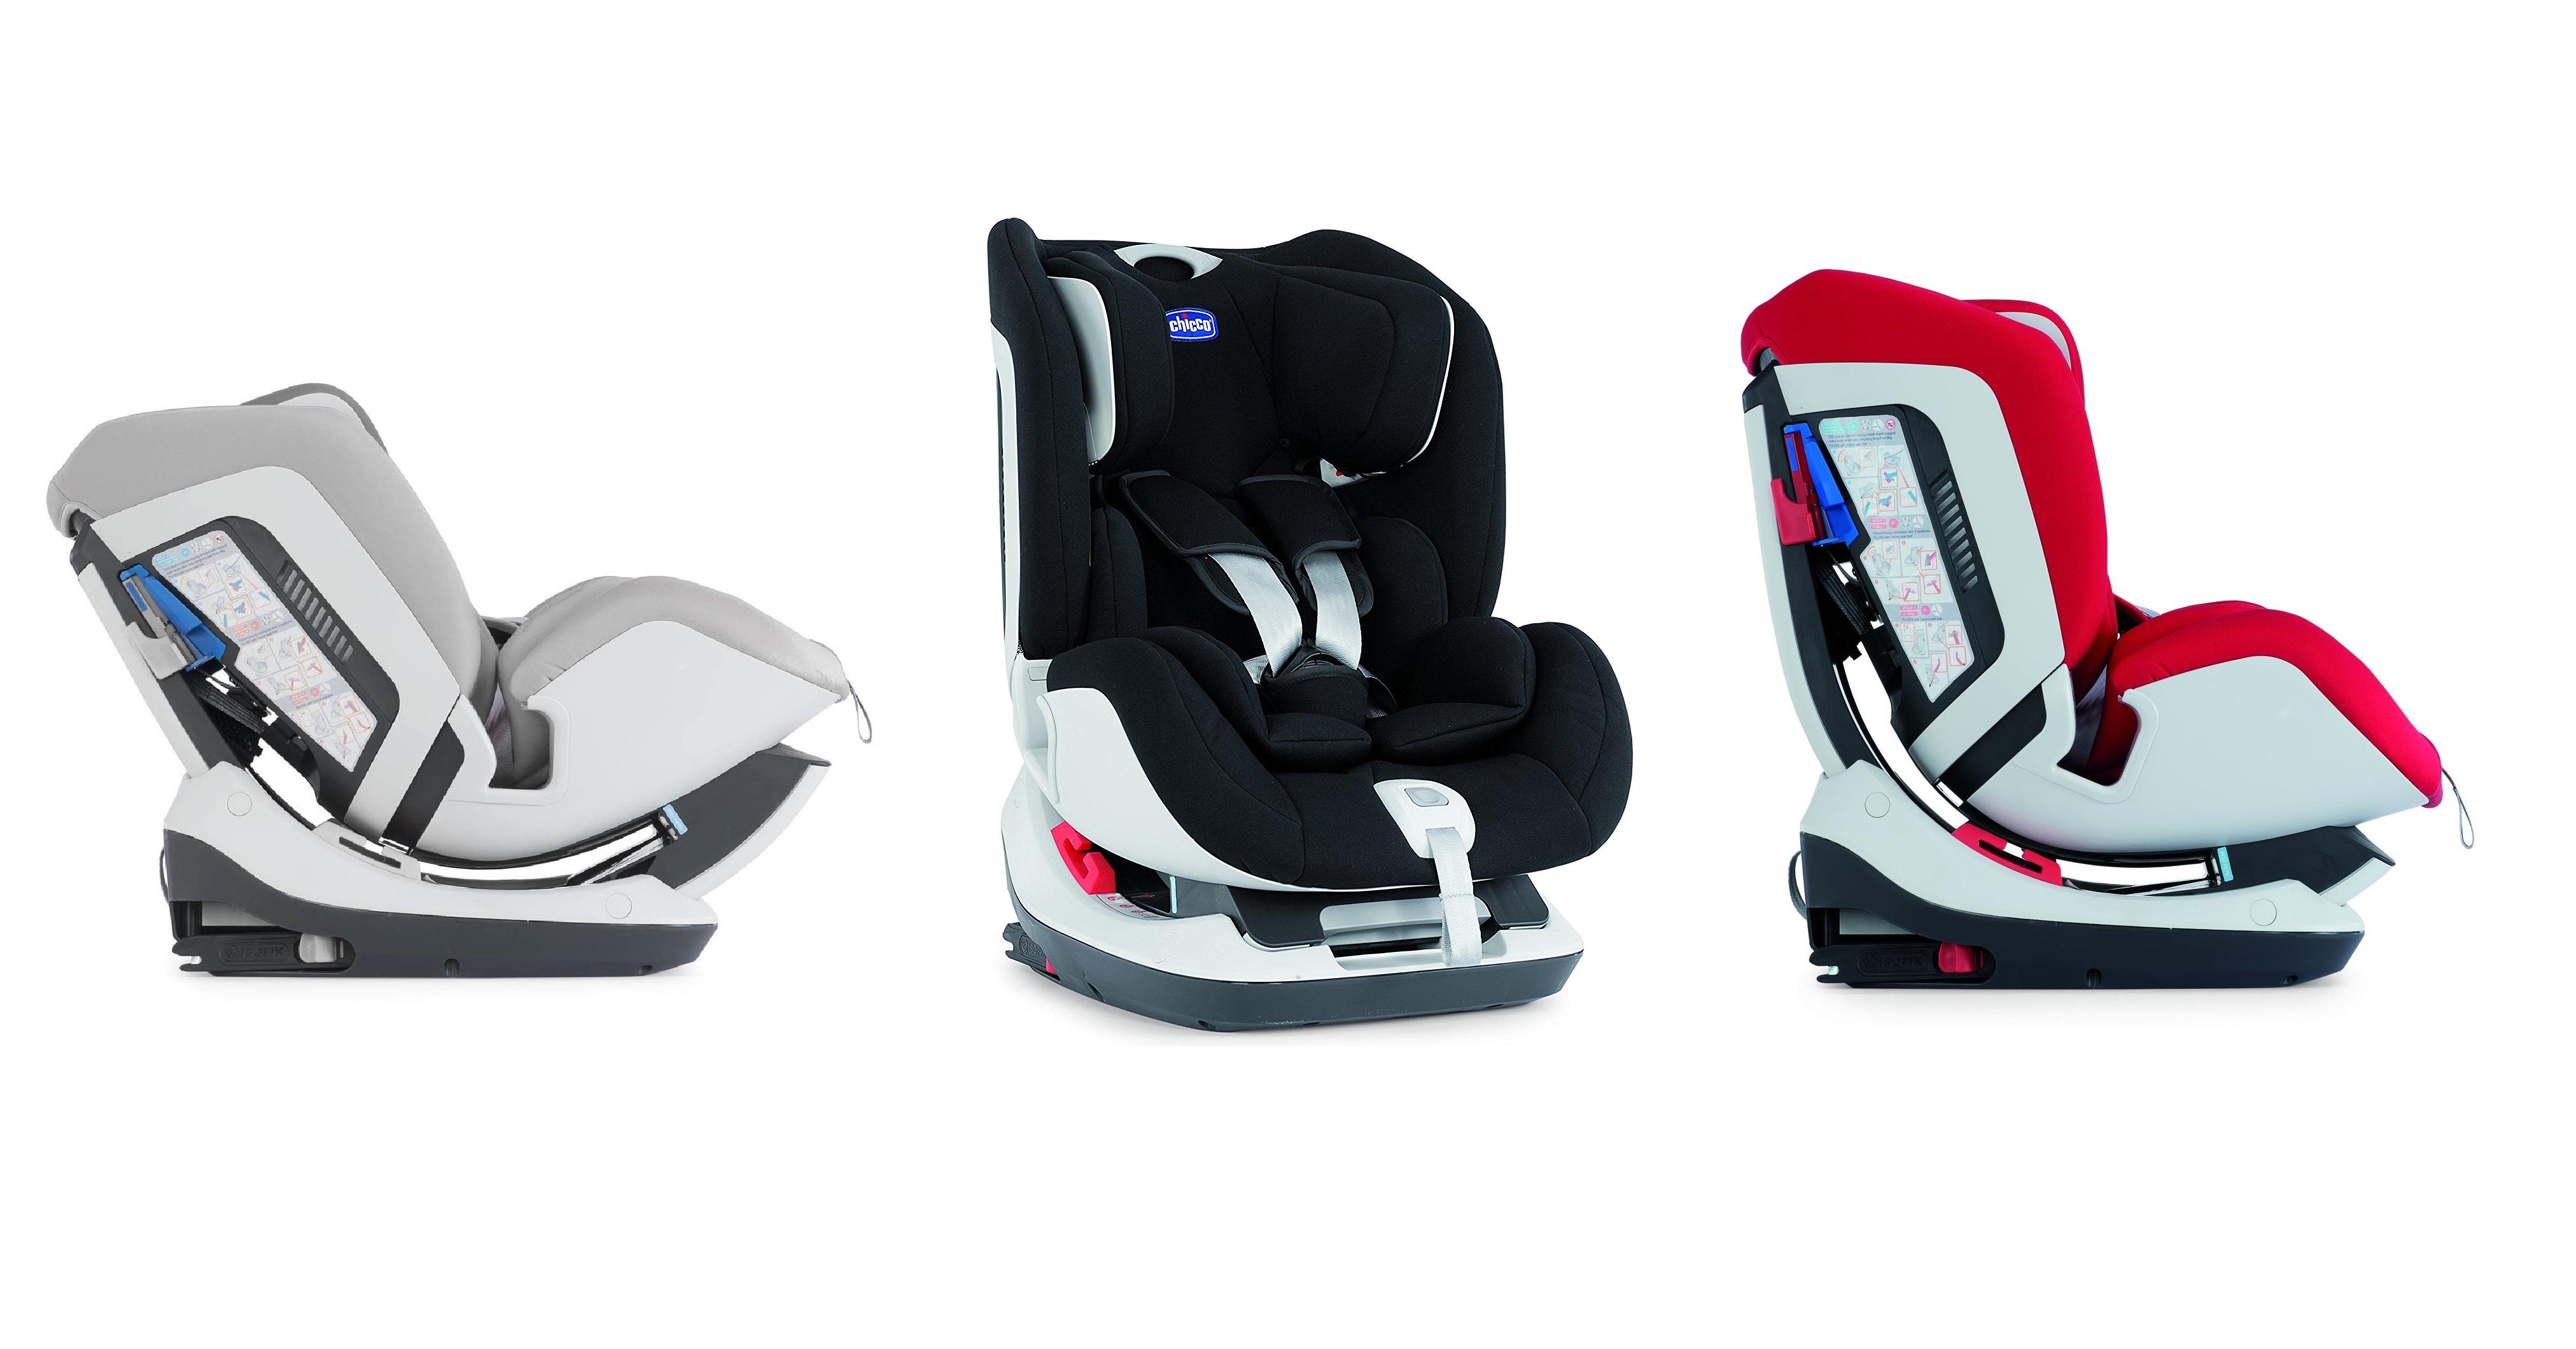 Silla de coche infantil chicco seat en amazon con 63 euros de descuento - Silla coche chicco ...